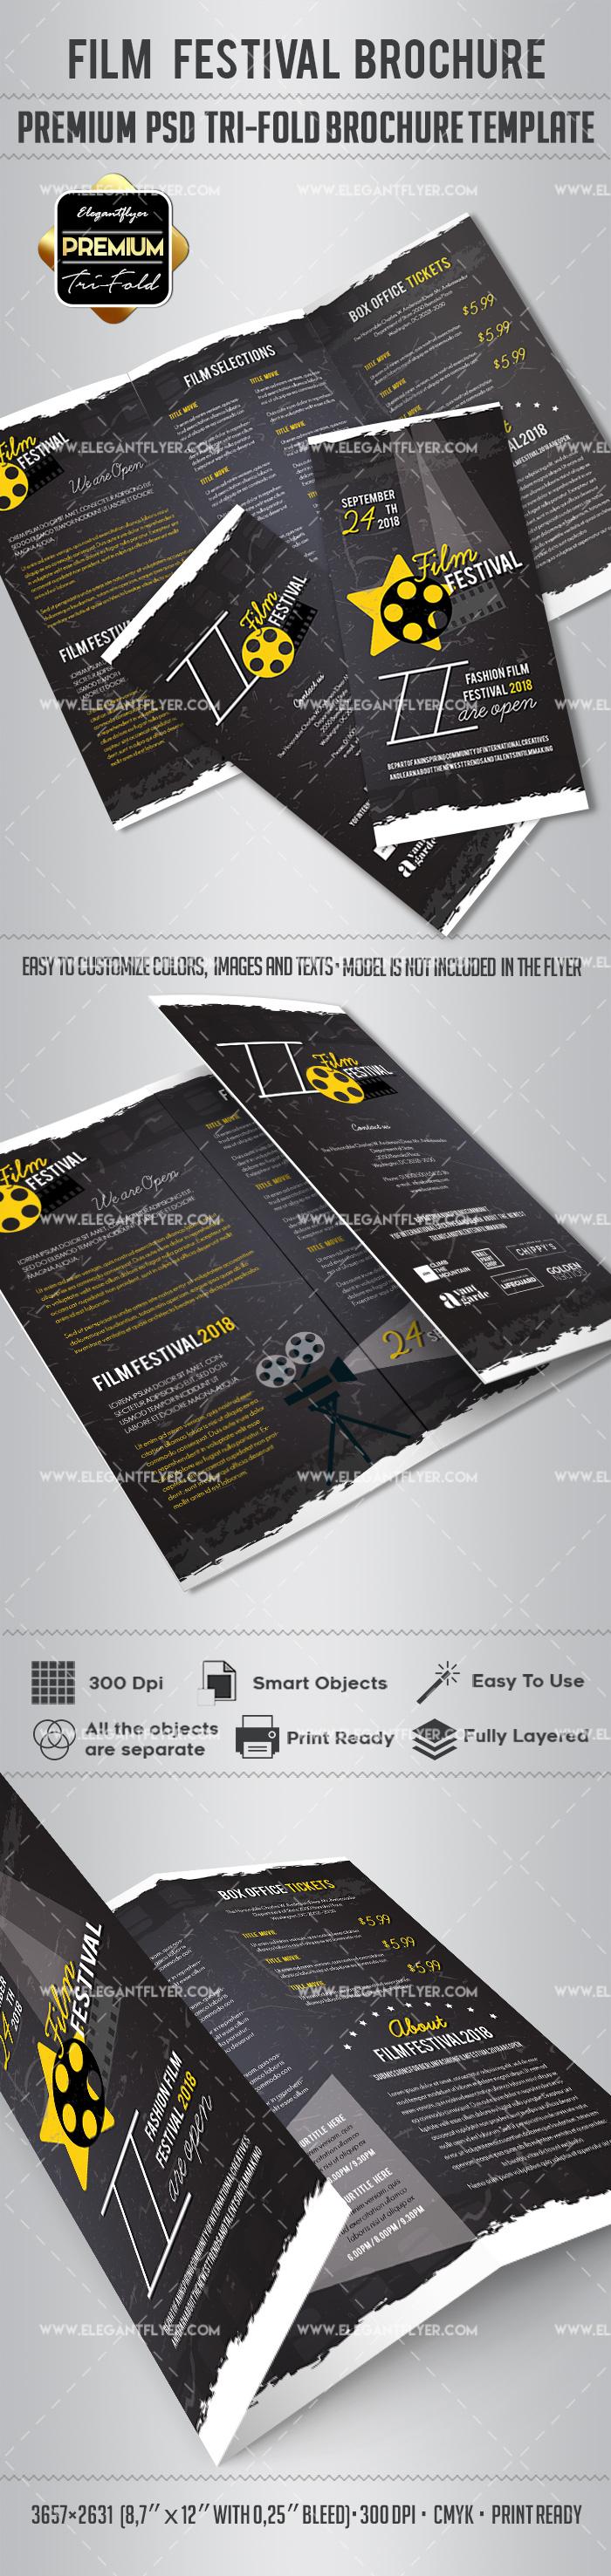 Film Festival Brochure Design Regarding Film Festival Brochure Template